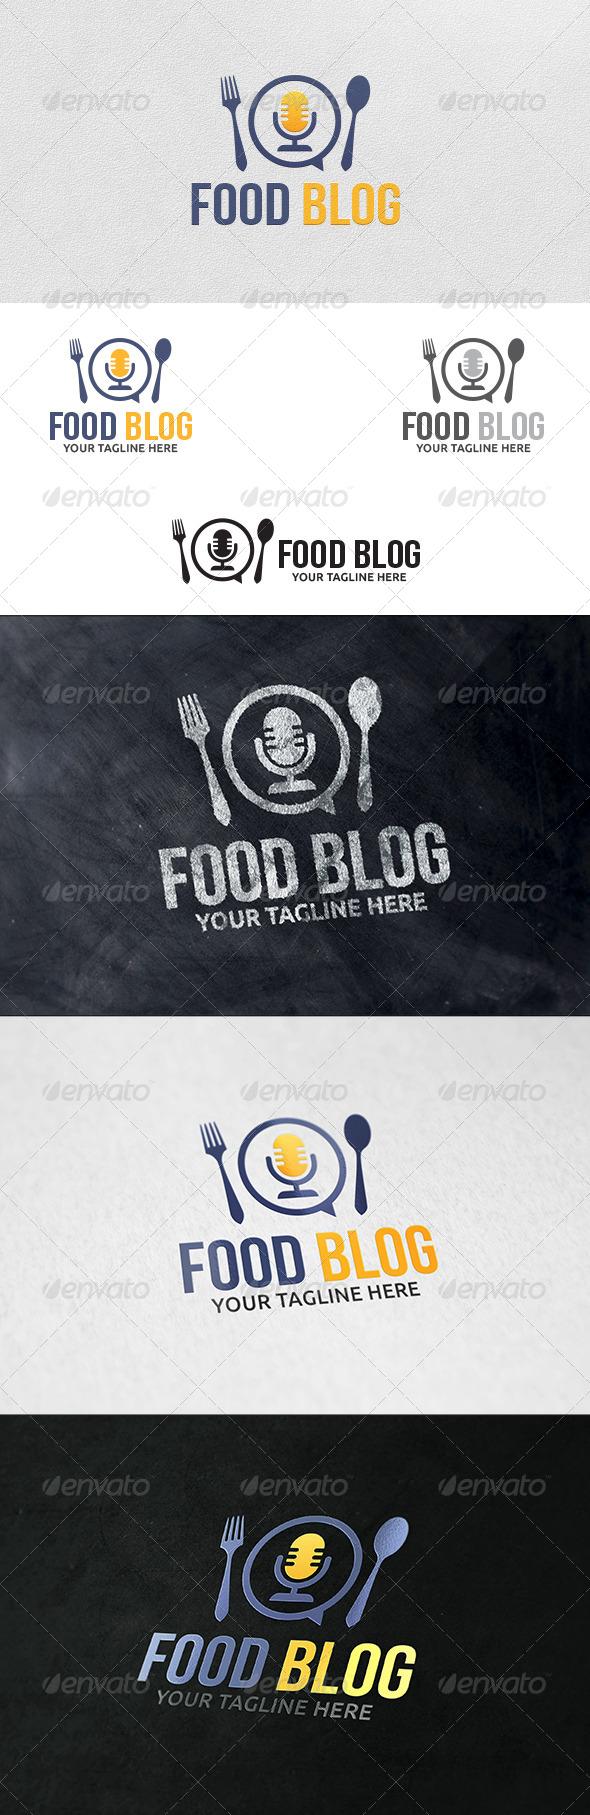 Food Blog - Logo Template